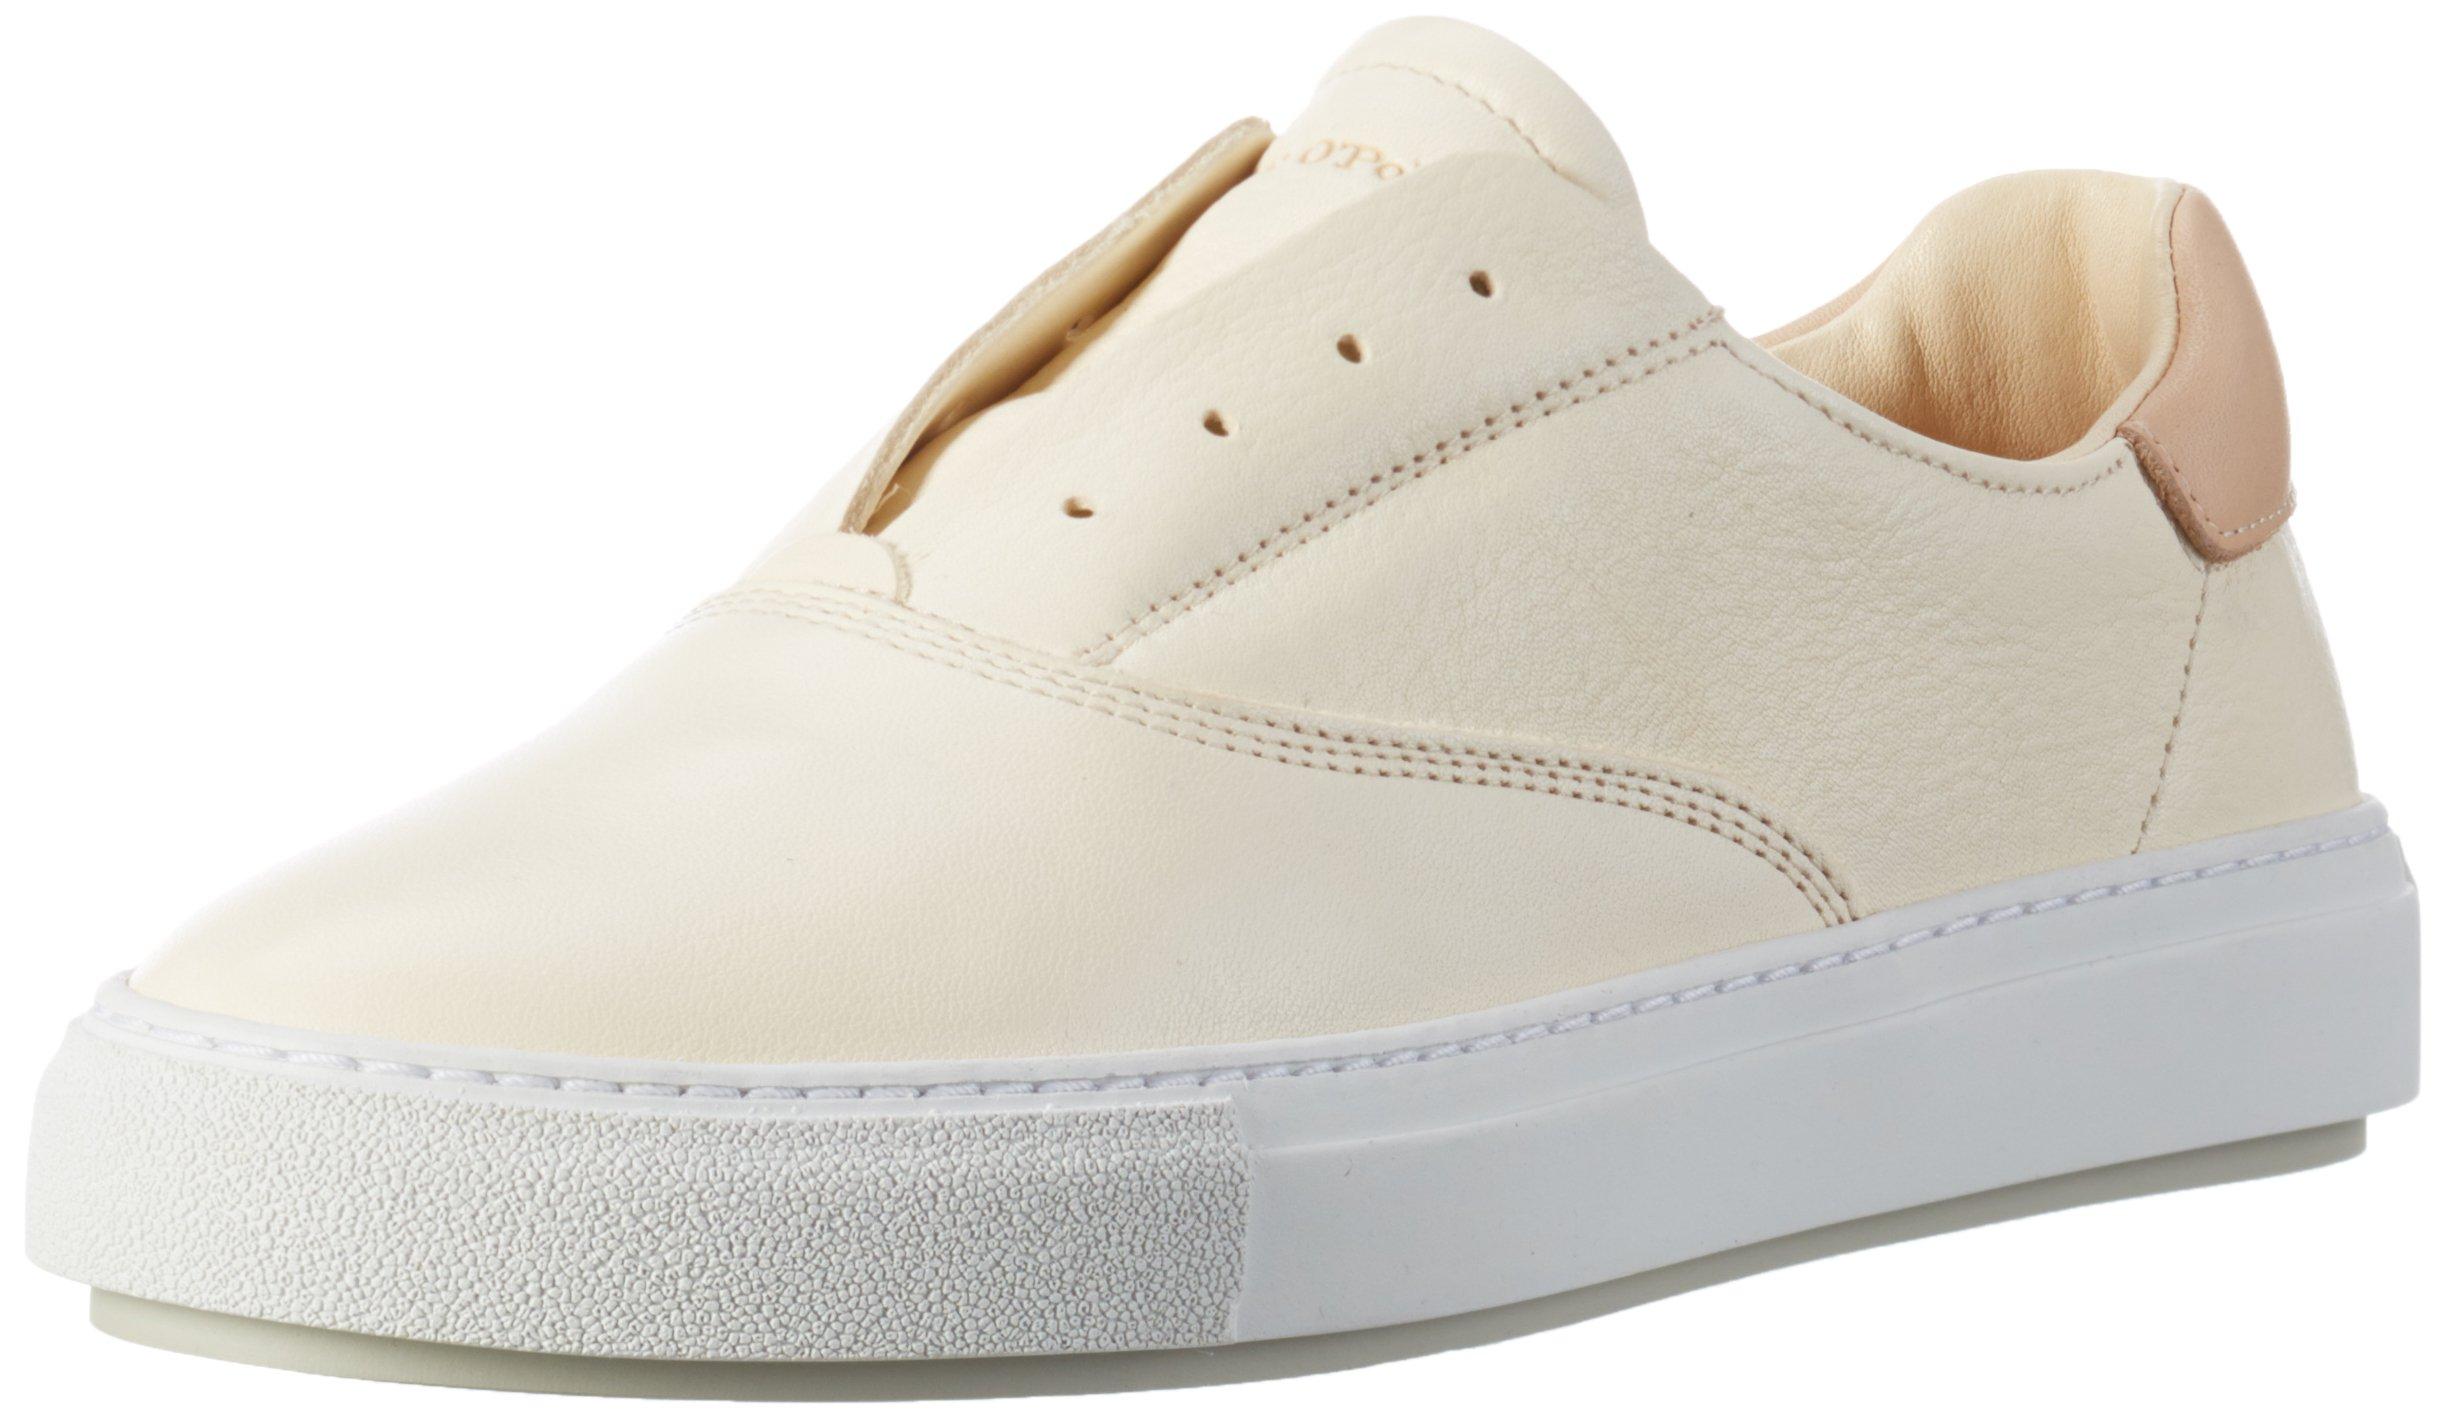 SneakerBaskets Marc Eu 11038 FemmeBlancoffwhite O'polo 70114053501102 UMqGSzVp